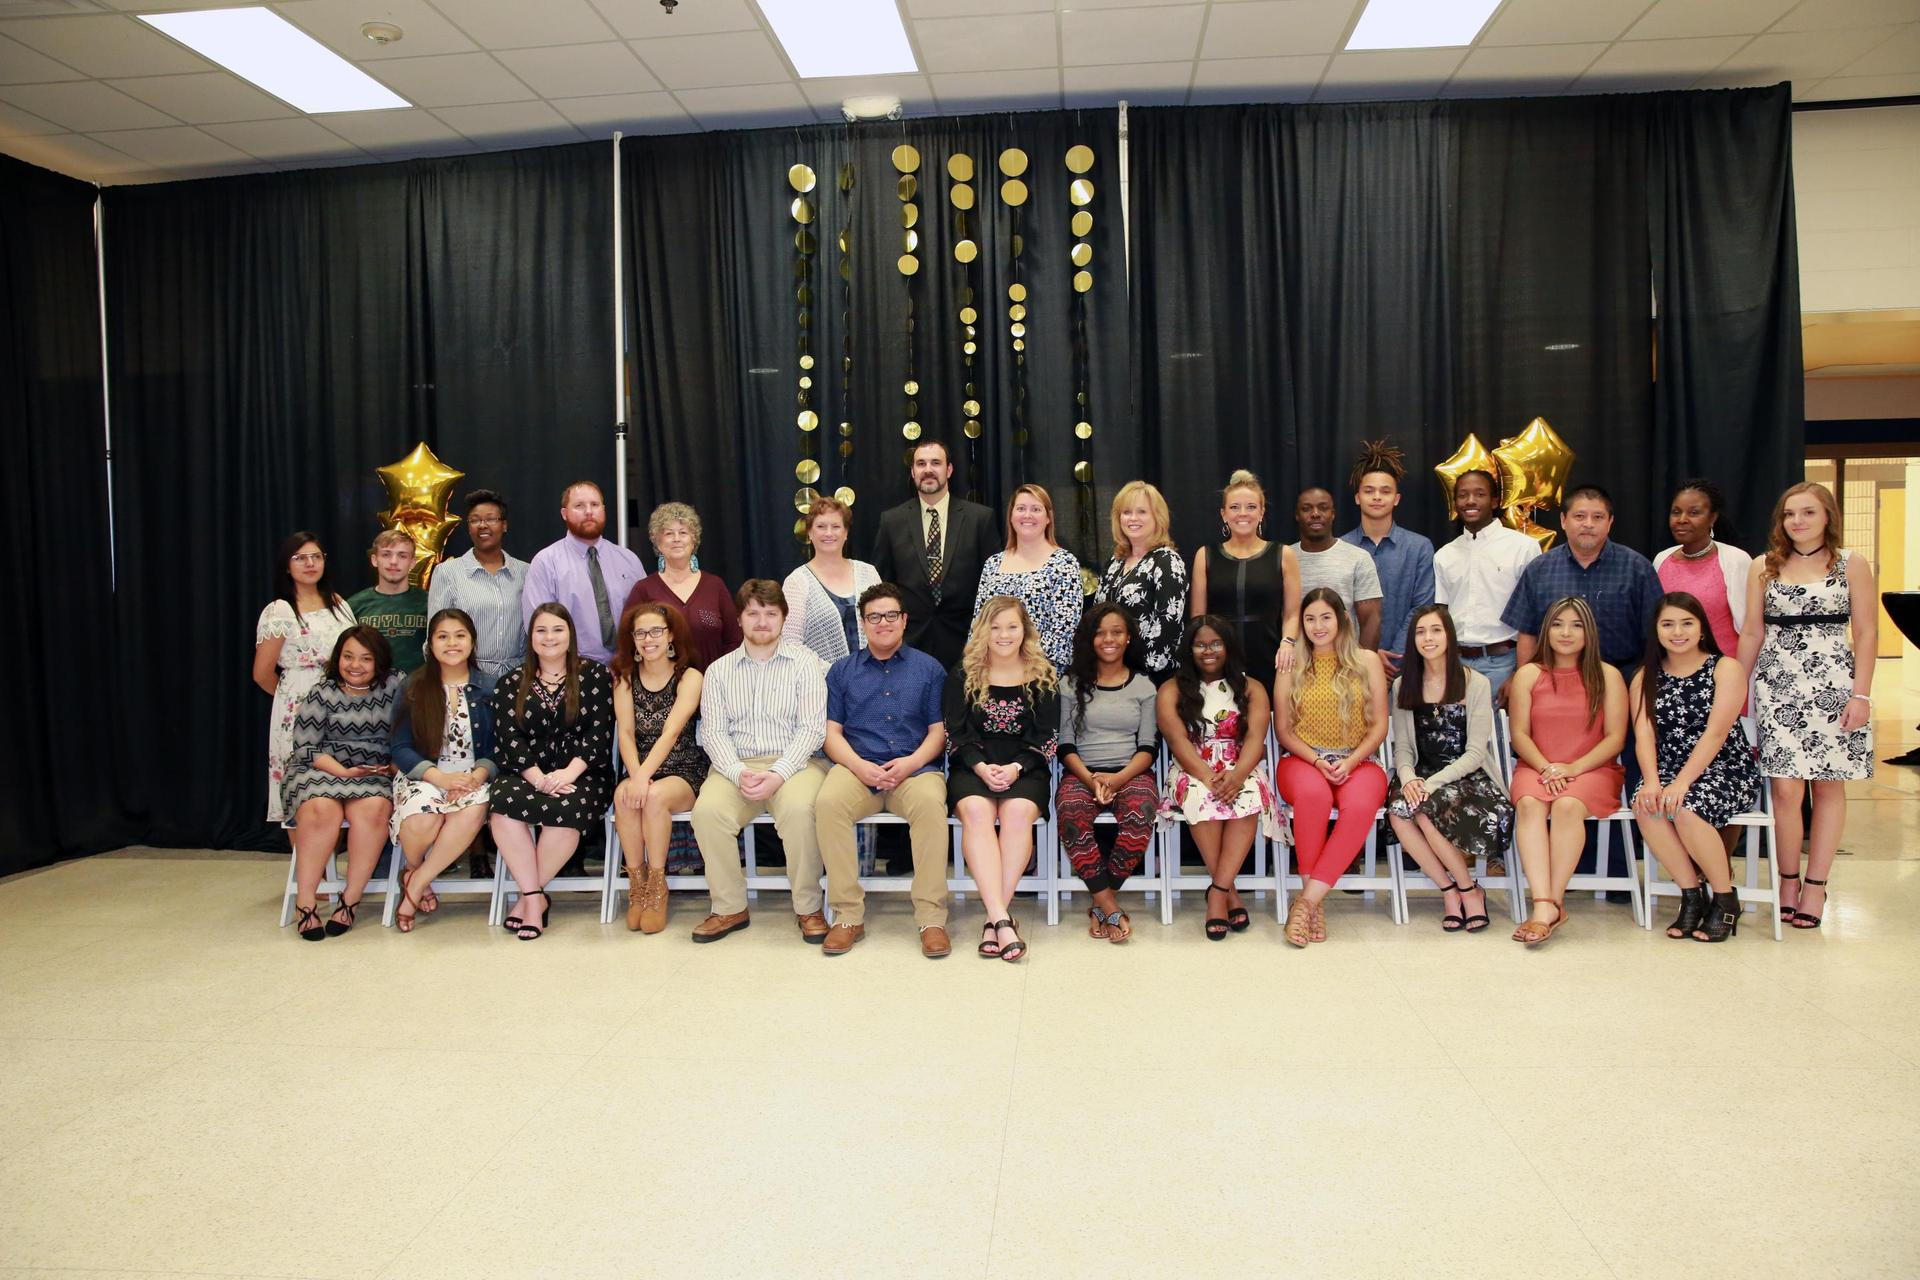 2018 Scholars Banquet - top 20 students